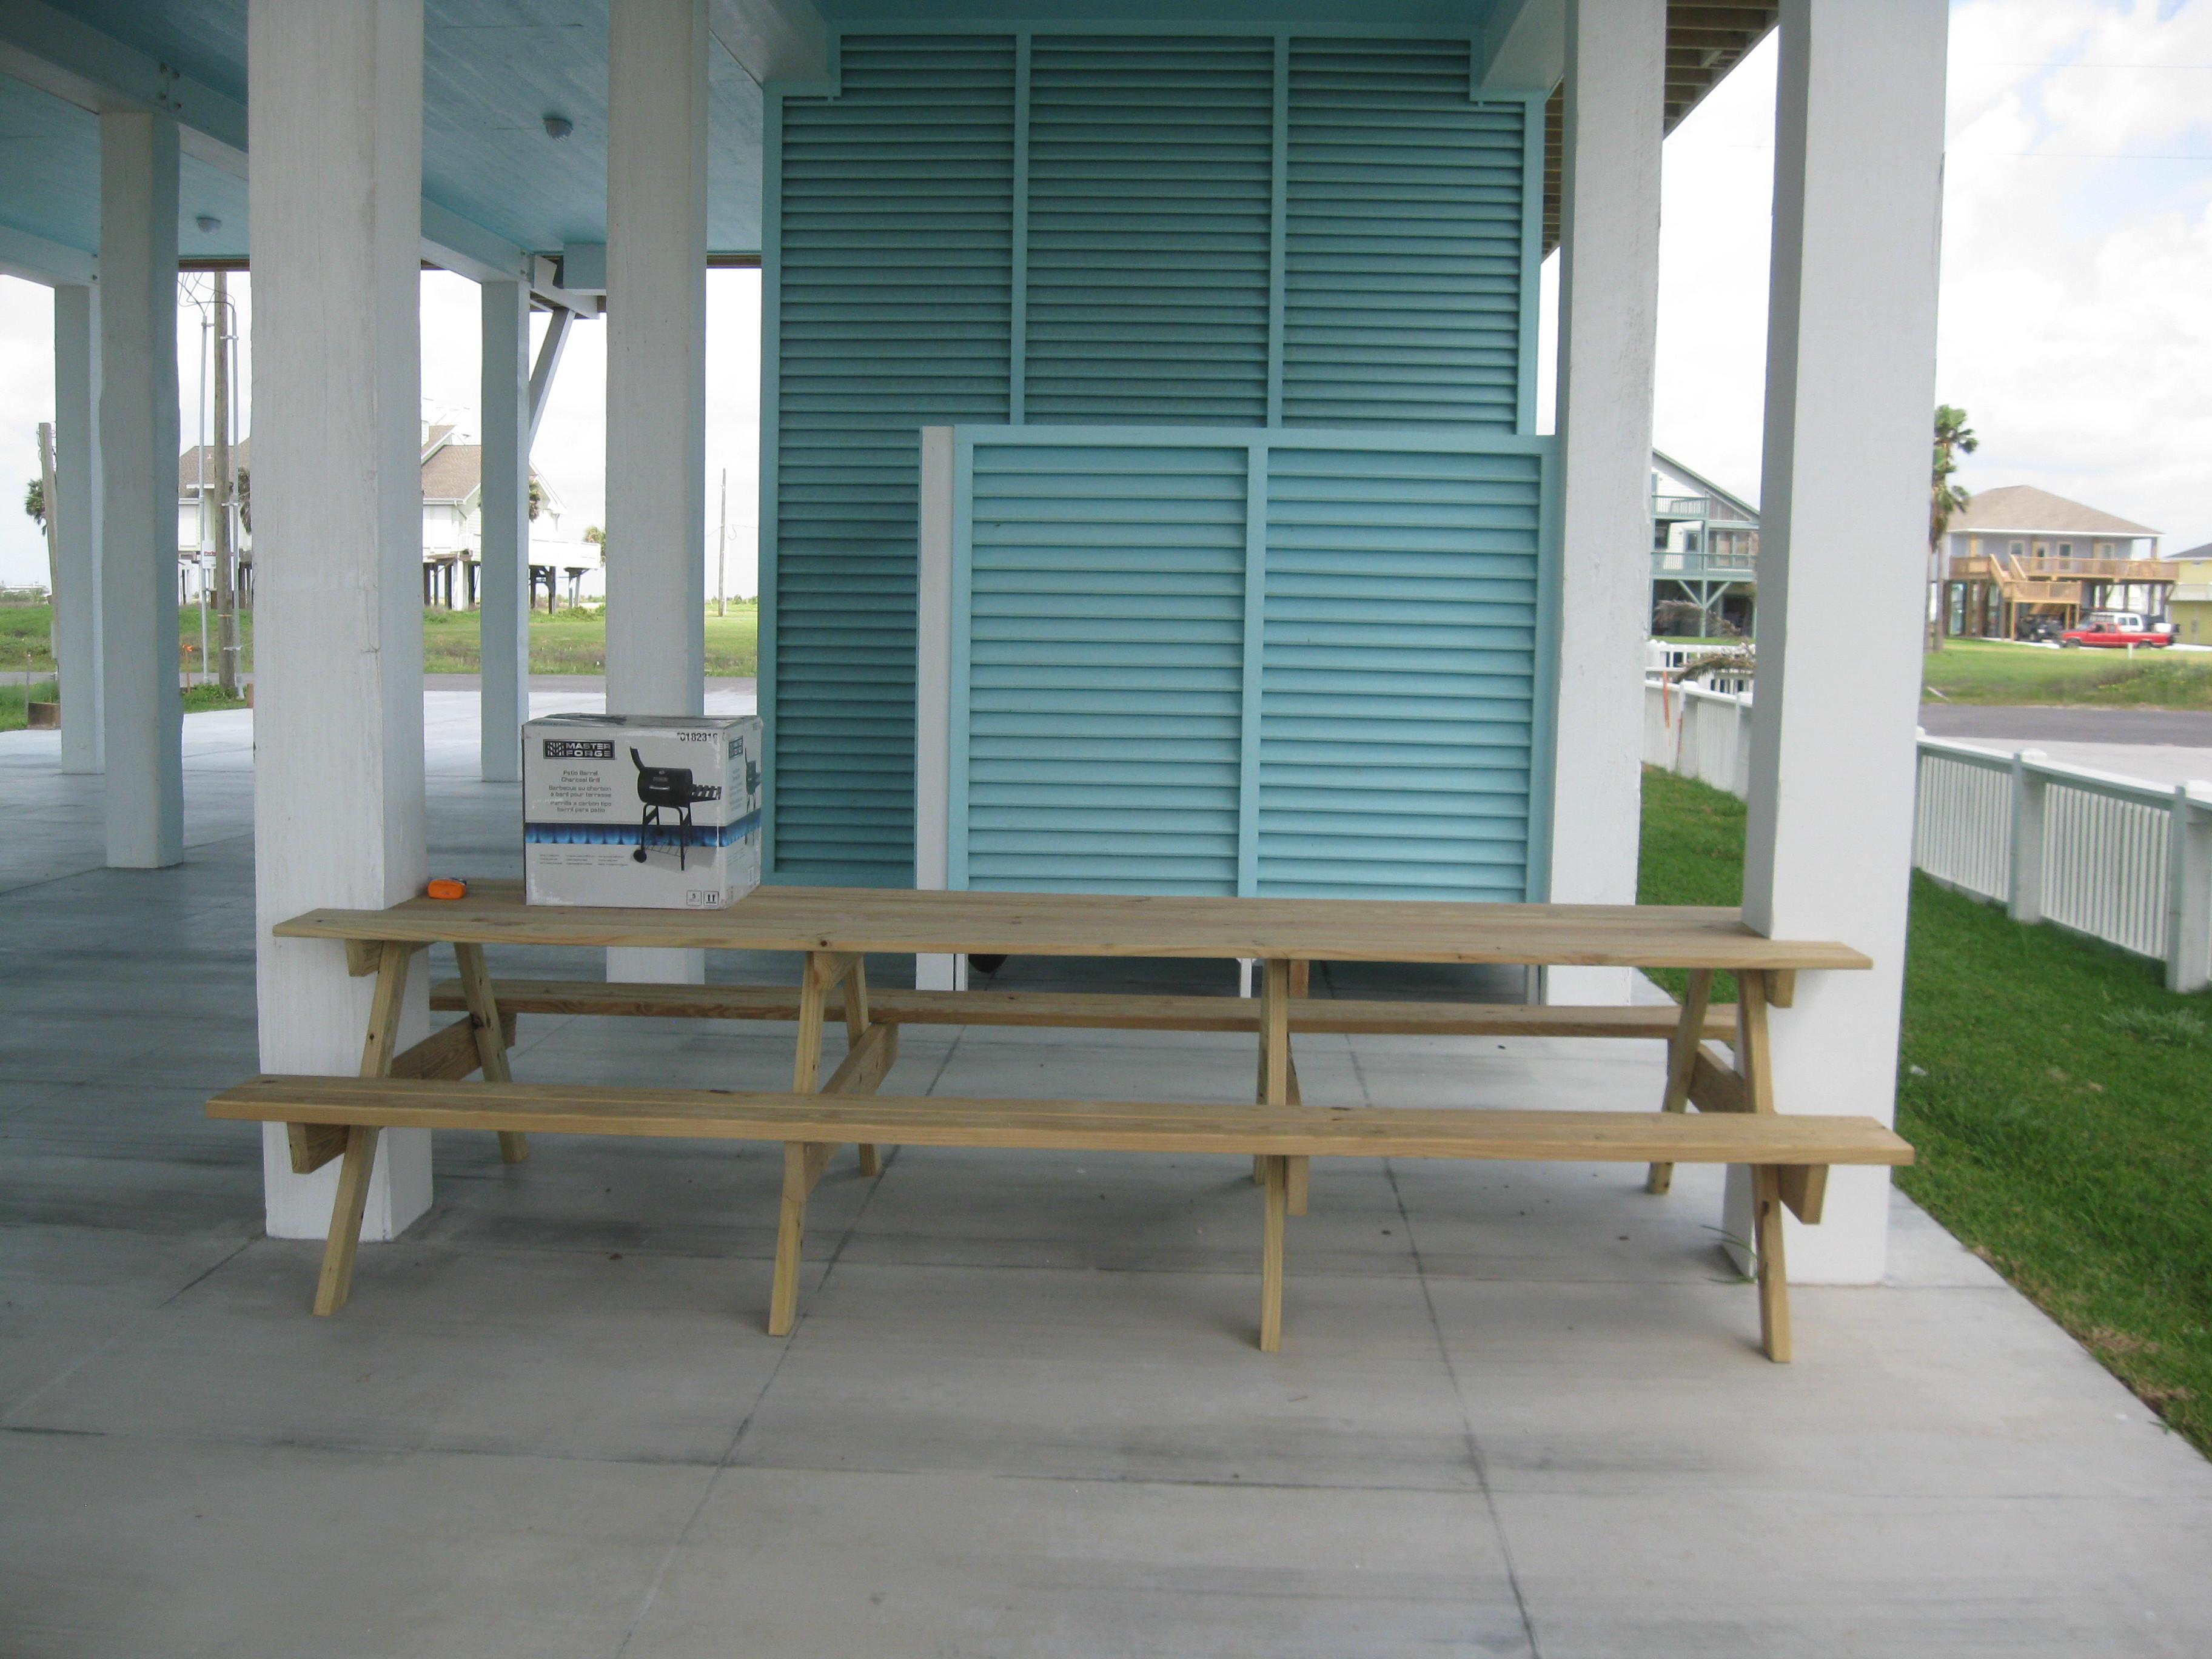 Copa Picnic Table/ Outside Shower